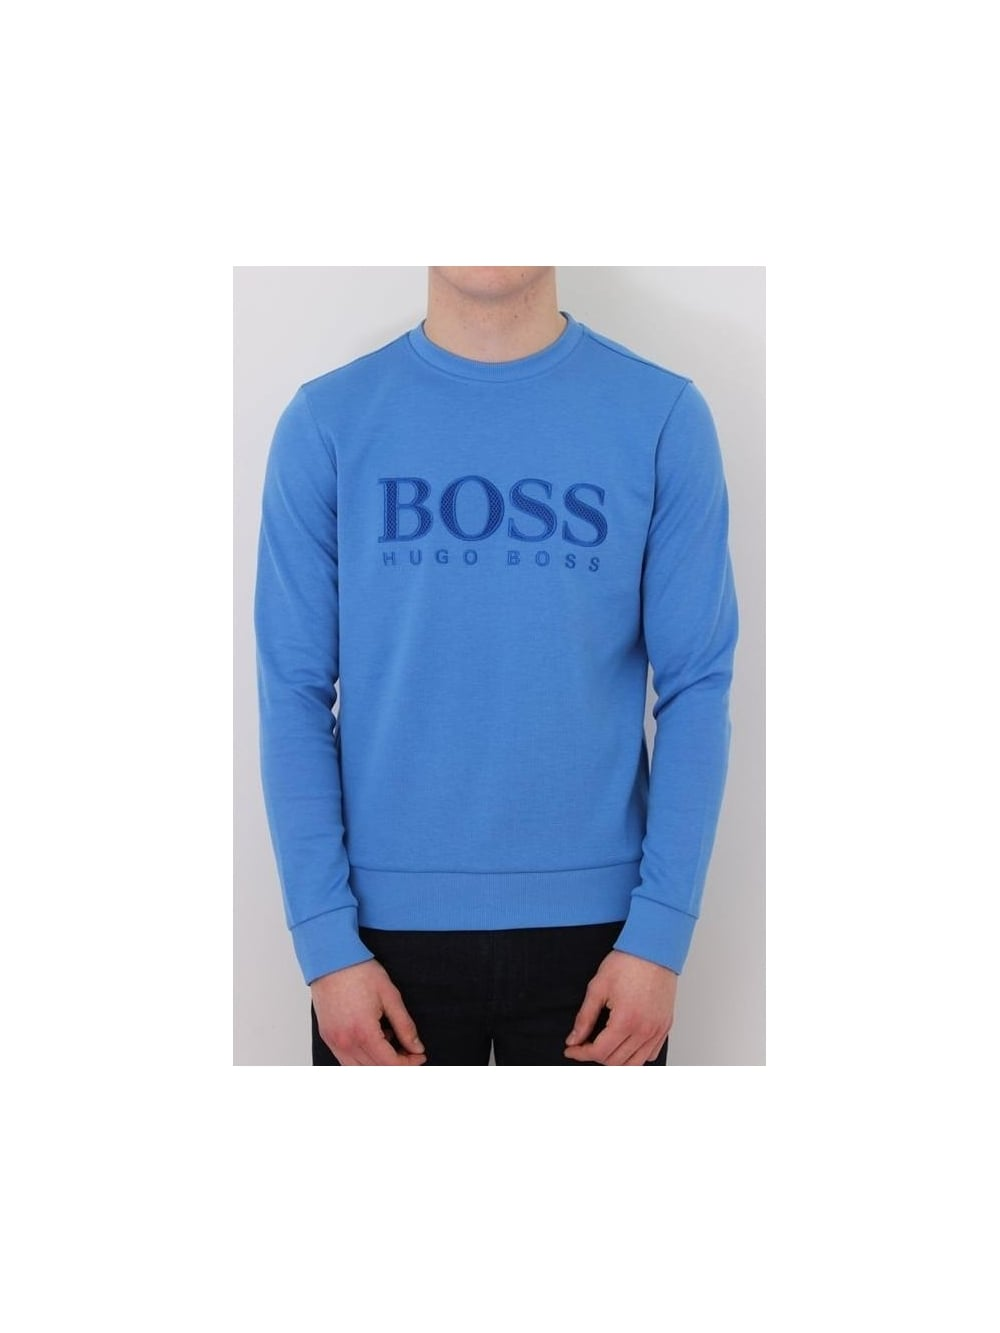 HUGO BOSS BOSS Green Salbo Sweat In Medium Blue - Northern Threads 8b38d48187b0